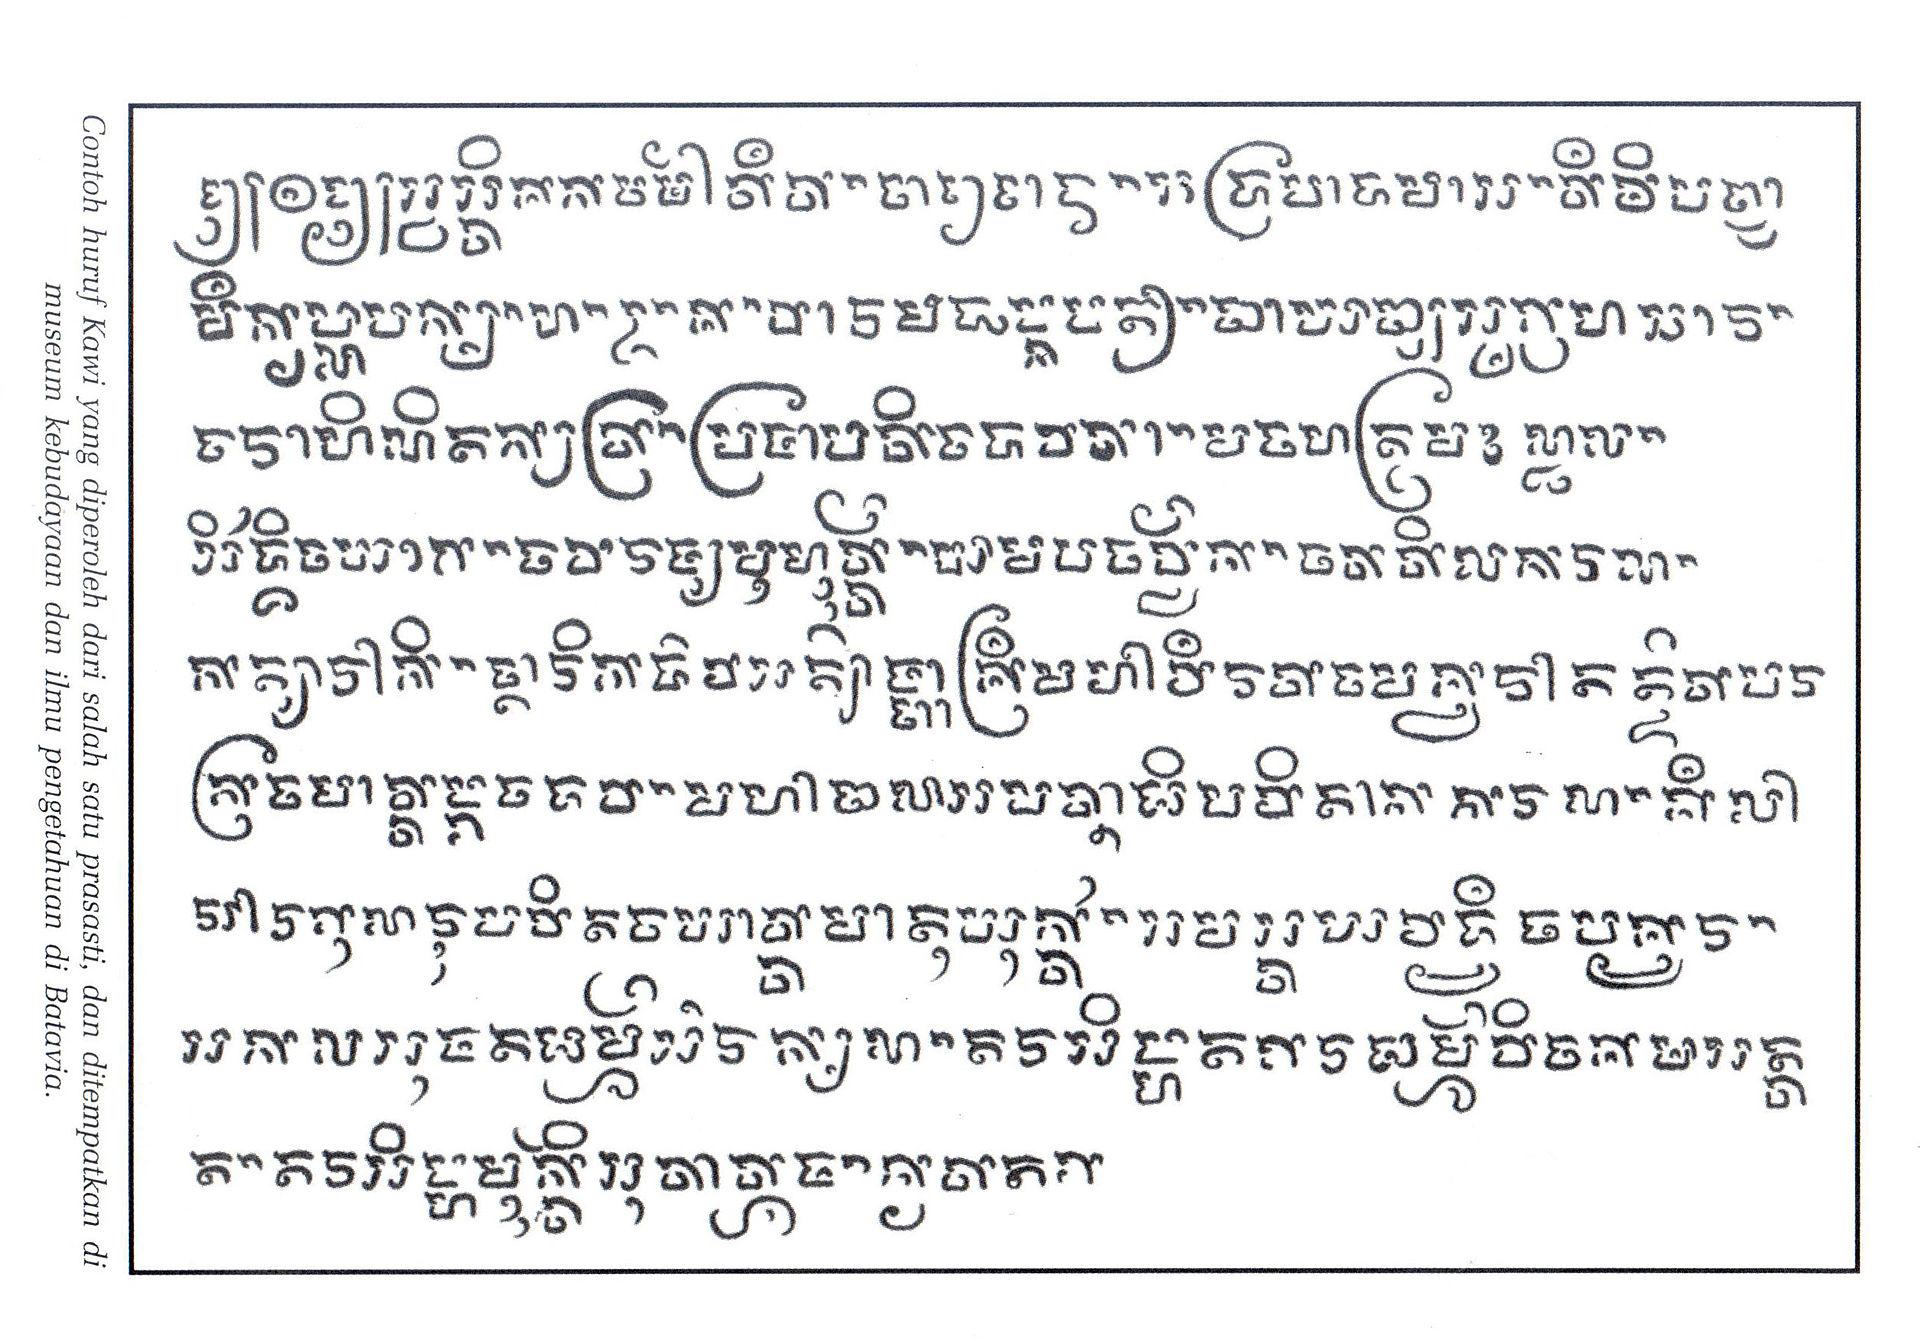 Alphabet original filipino Baybayin, The